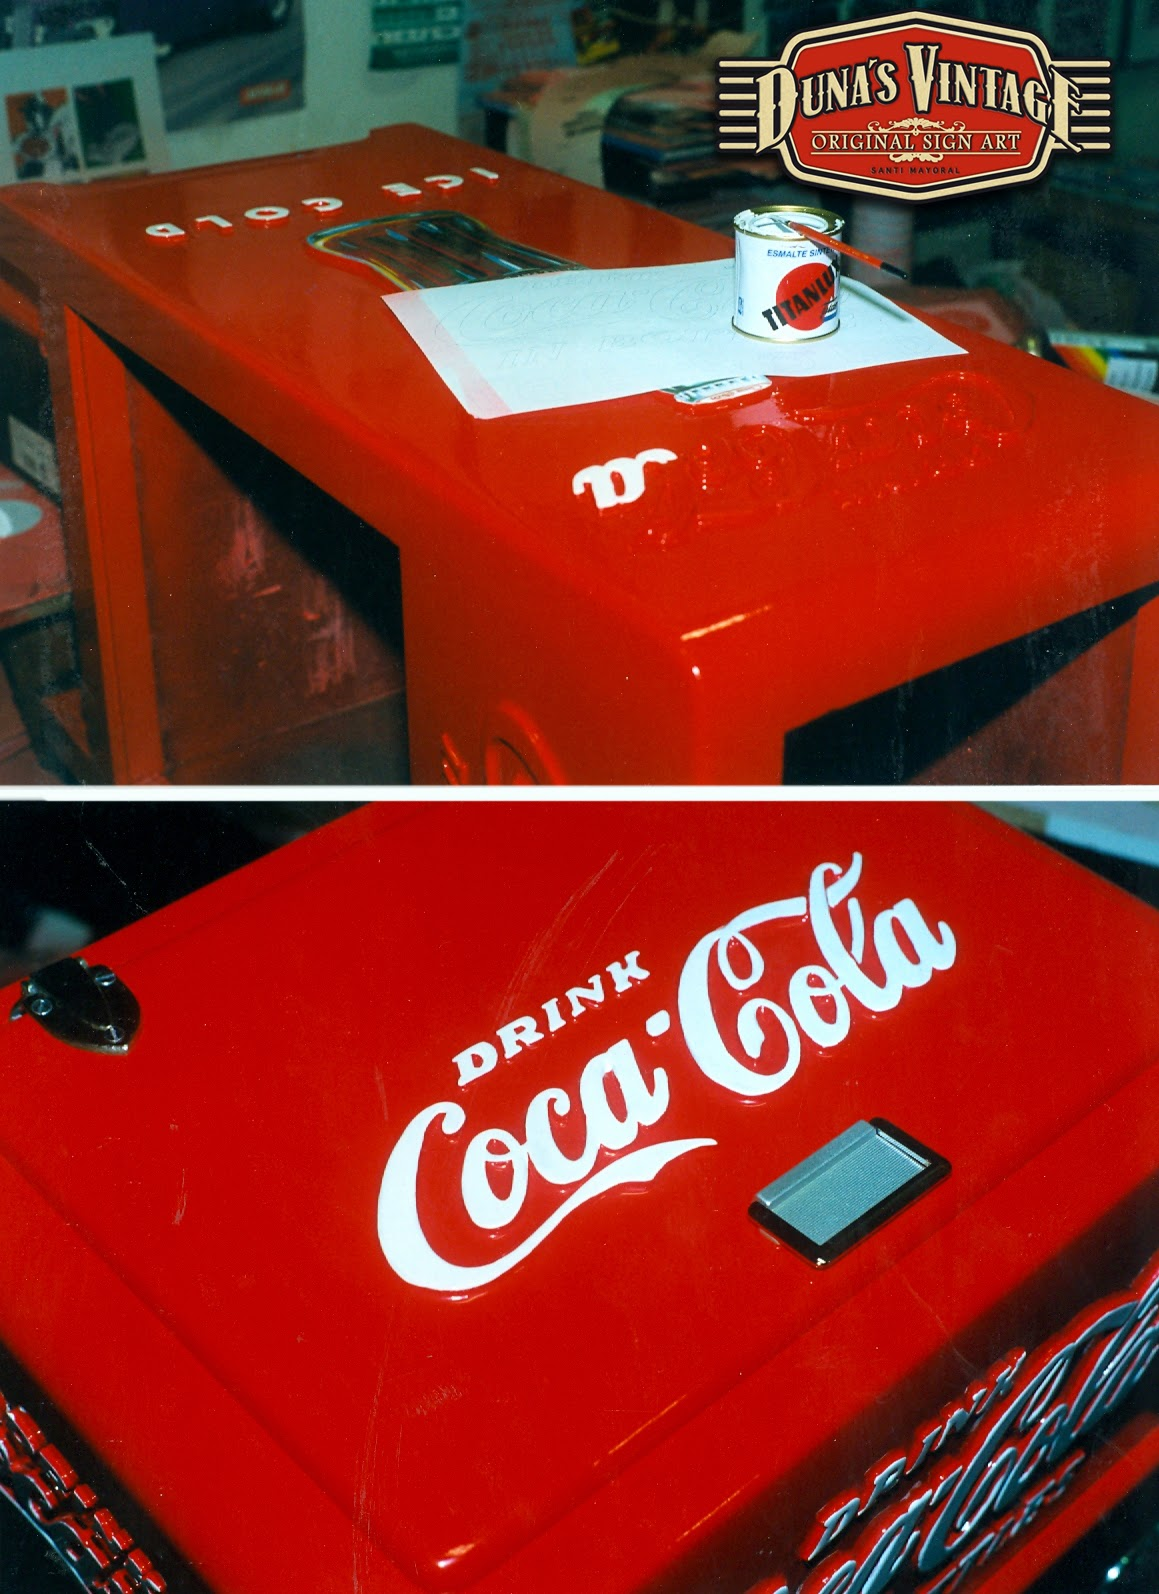 Duna s vintage nevera coca cola 40 duna s vintage - Nevera coca cola retro ...